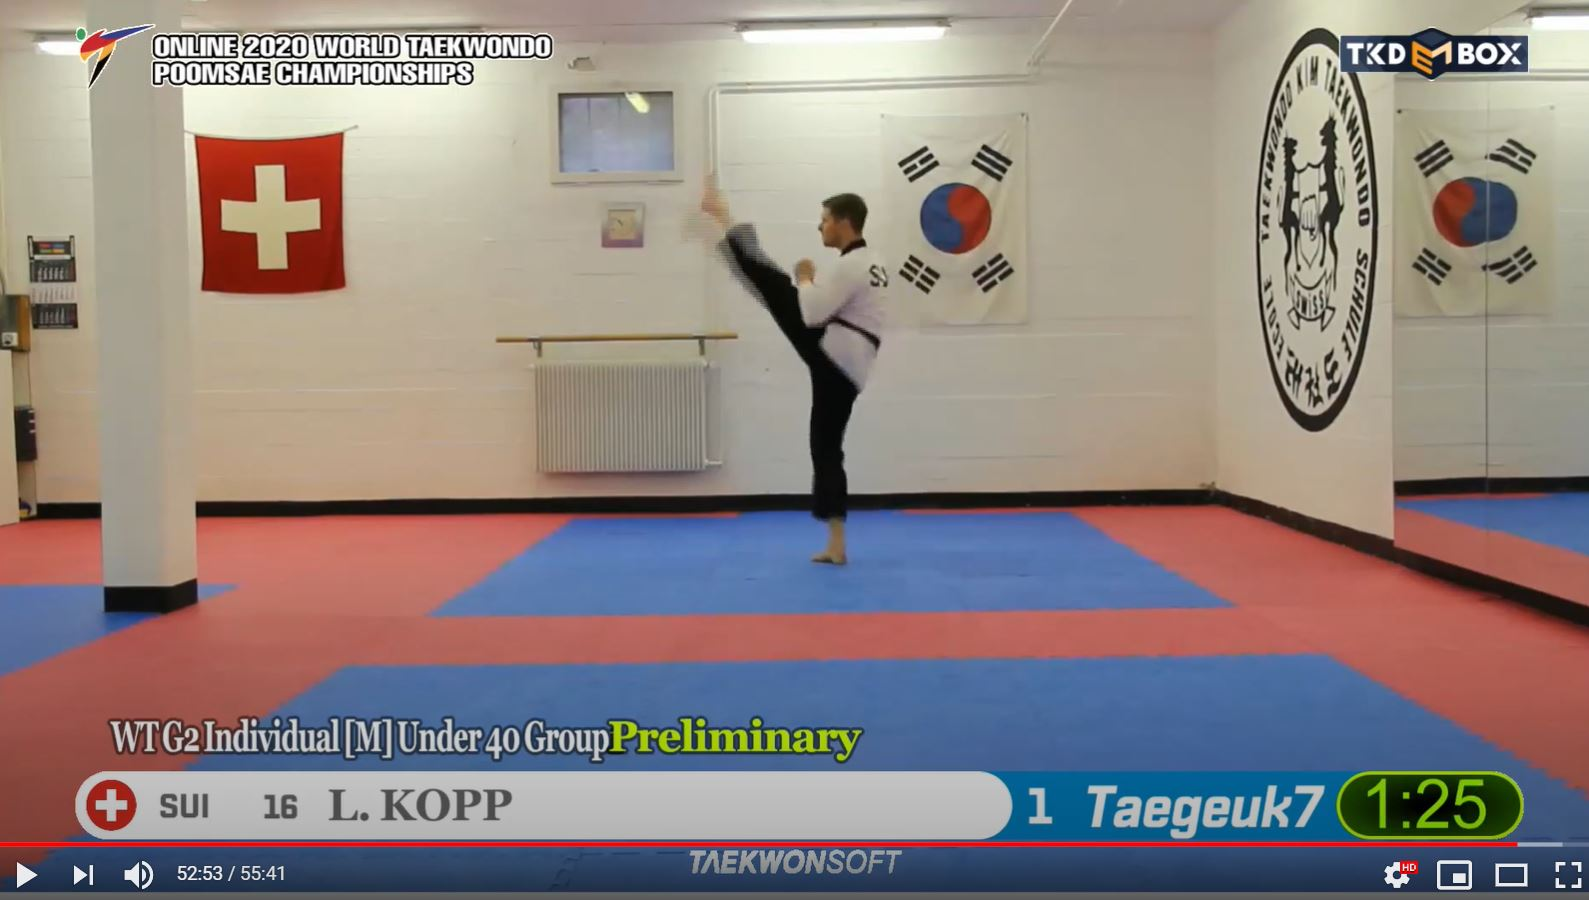 Results Preliminary Round Online 2020 World Taekwondo Poomsae Championships